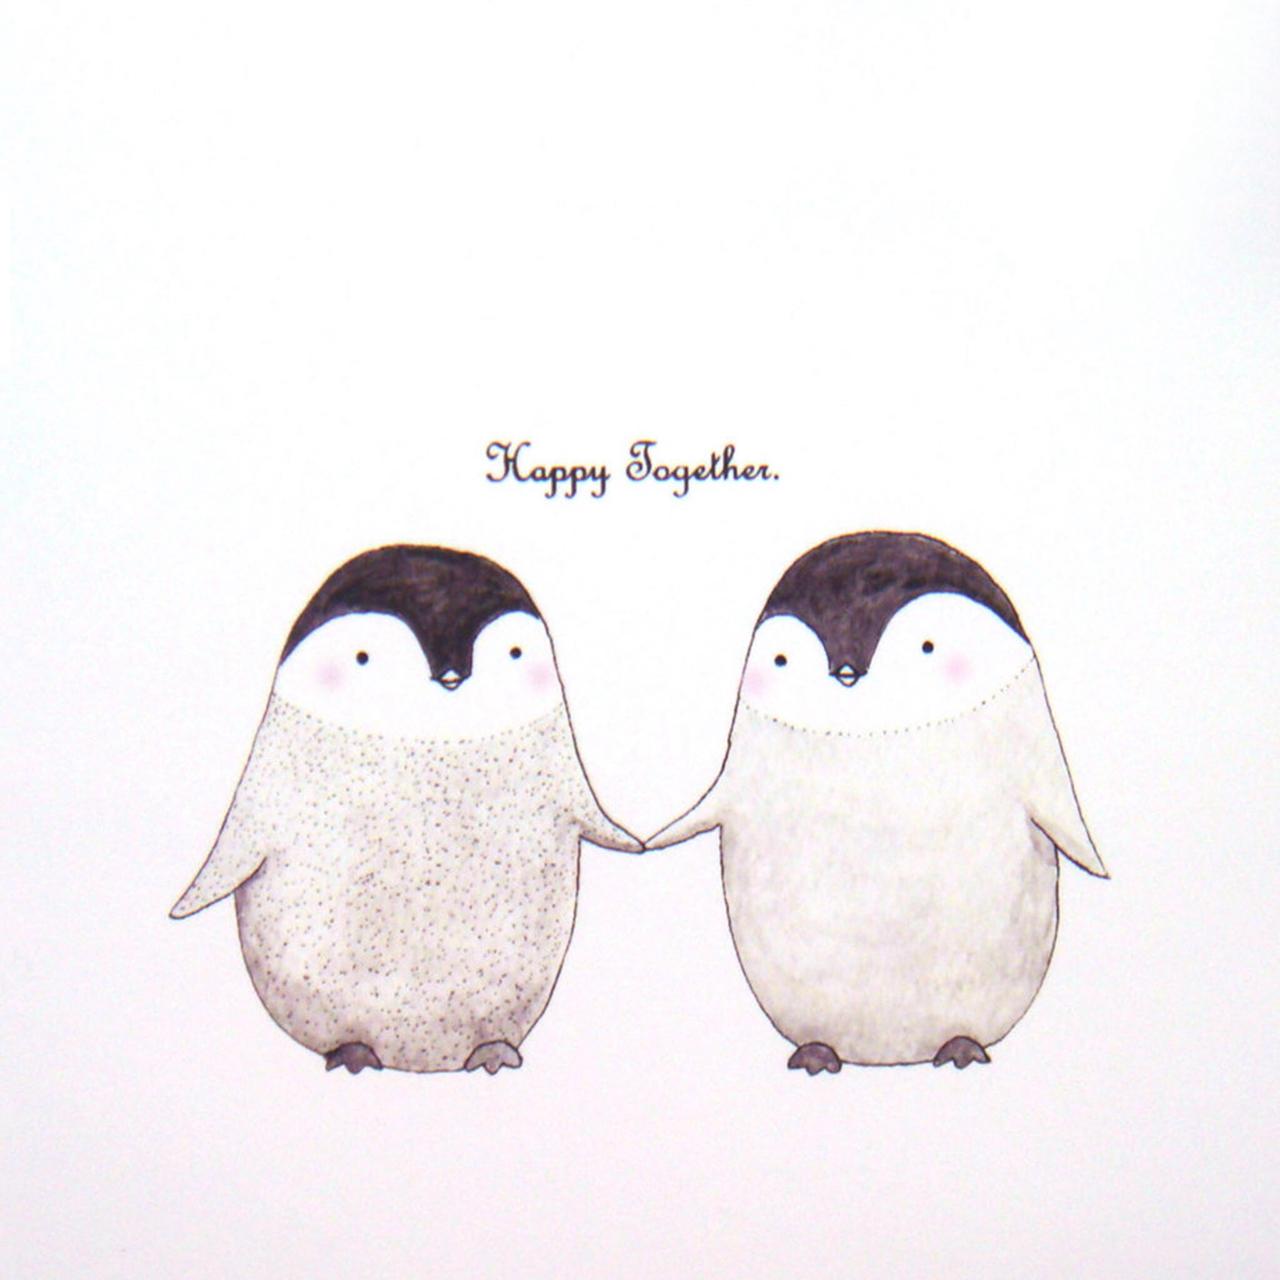 Cartoon Cute Friendship Love Quote Relationships Sweet Together Wallpaper Kawaii Cute